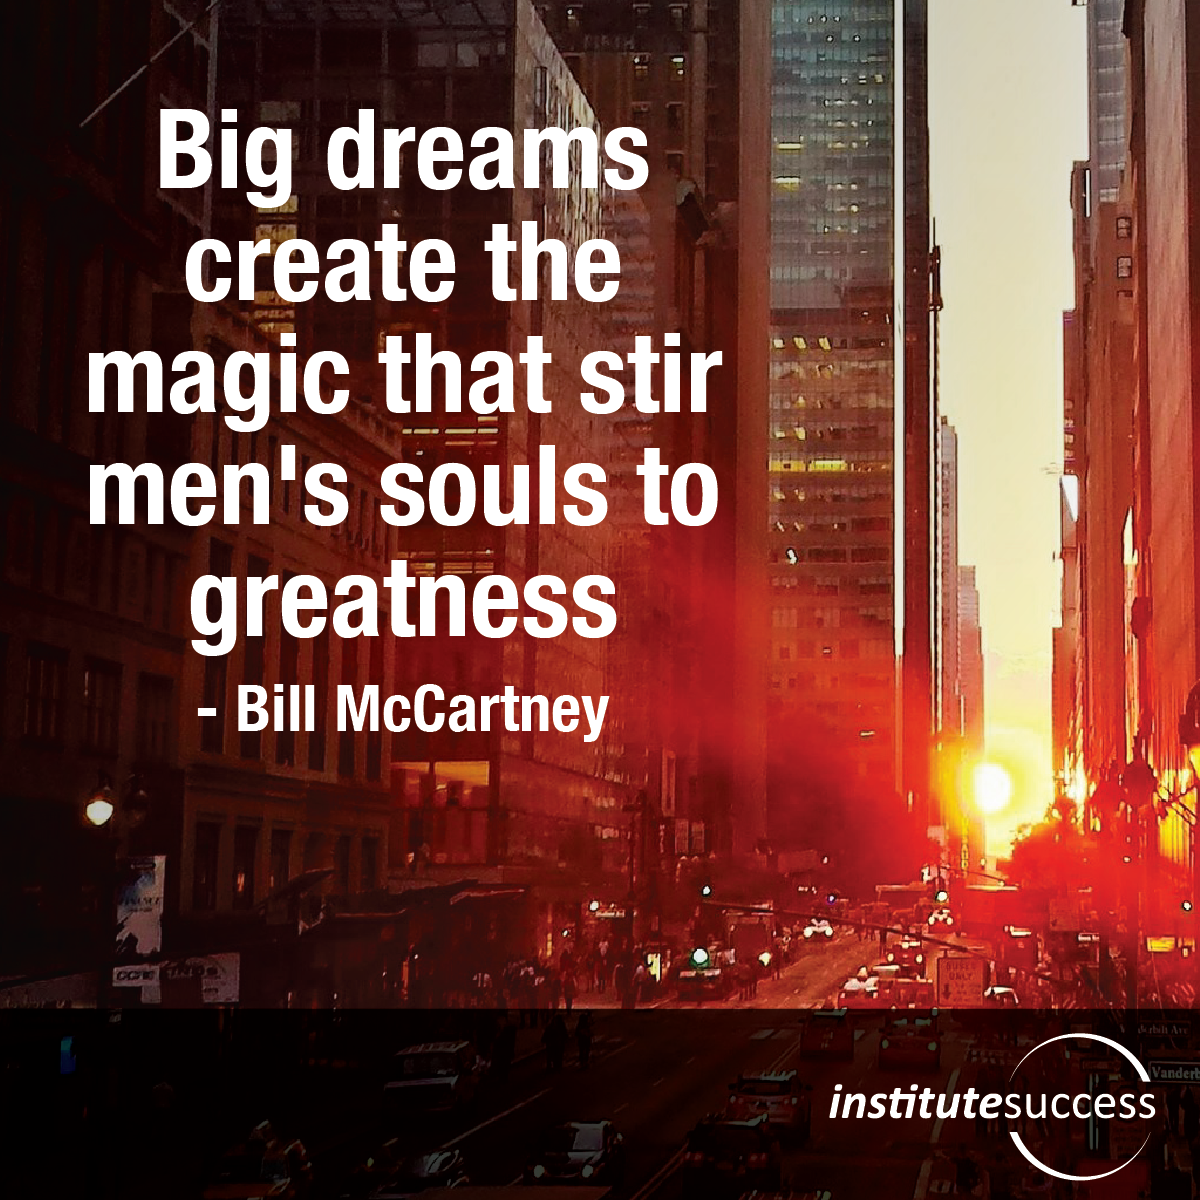 Big dreams create the magic that stir men's souls to greatness – Bill McCartney